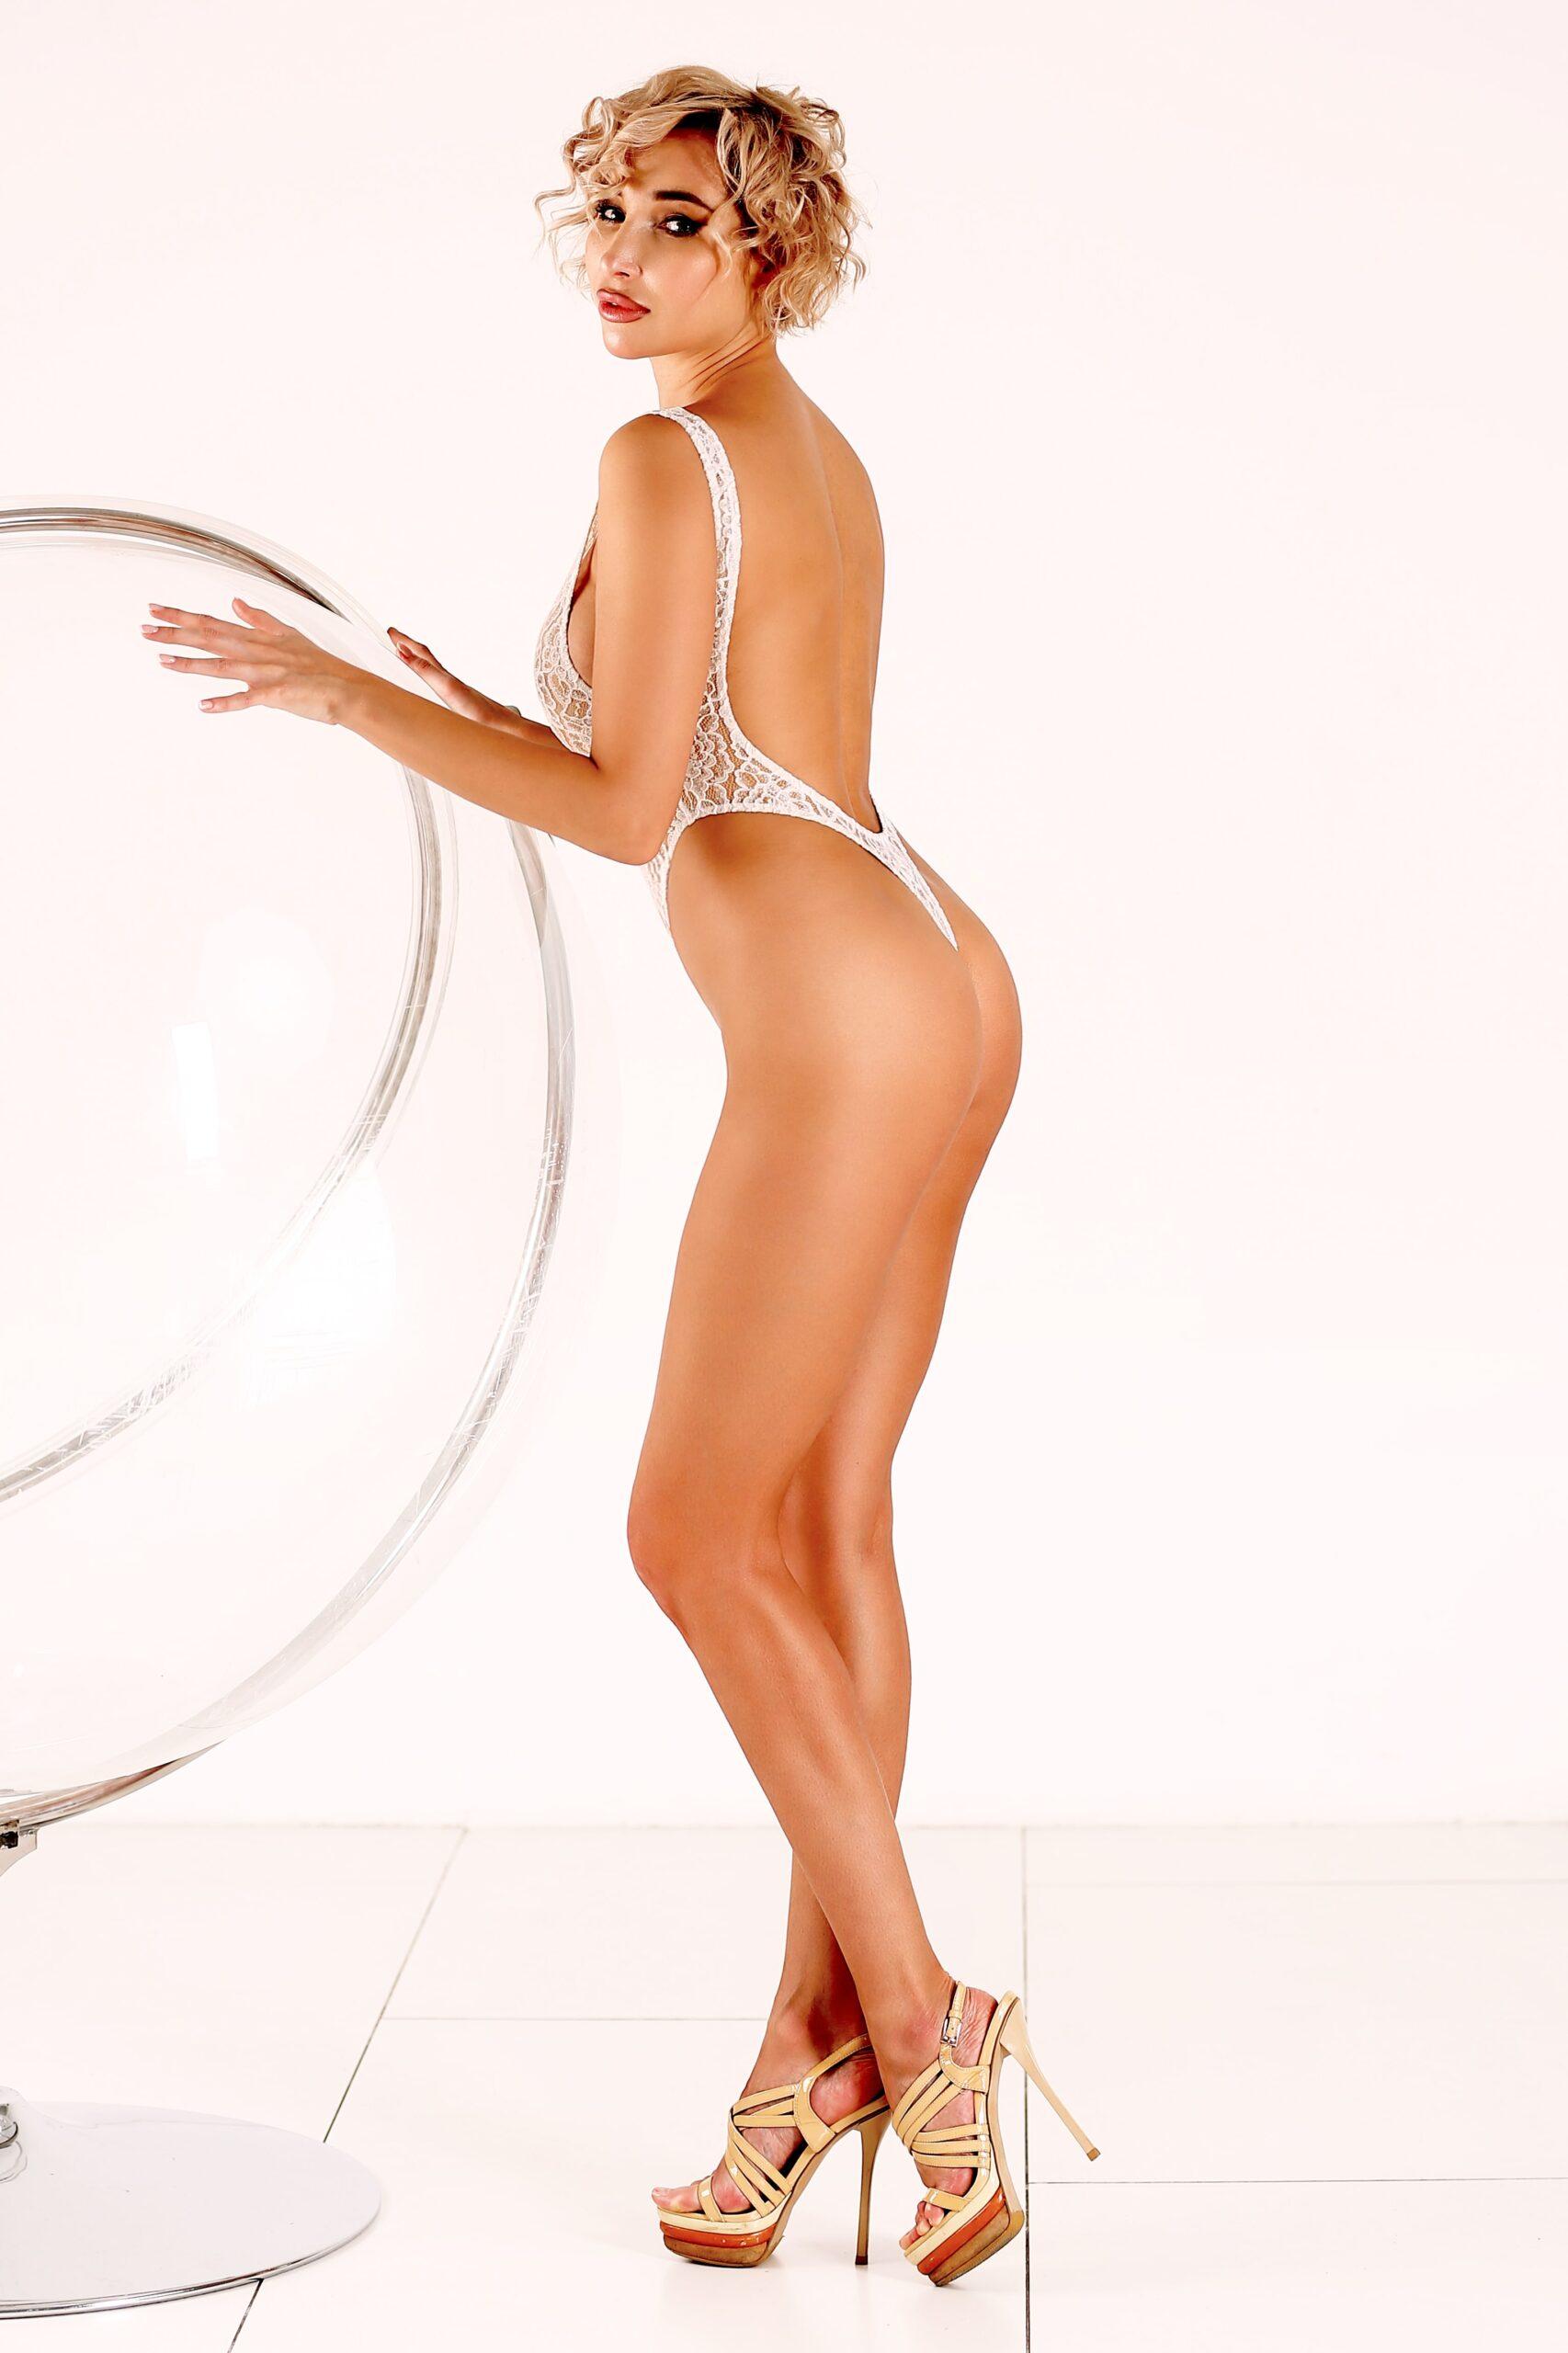 See through lace lingerie Sheer bodysuit Sexy mesh thong one piece swimsuit Cheeky white monokini erotic high cut leg women underwear